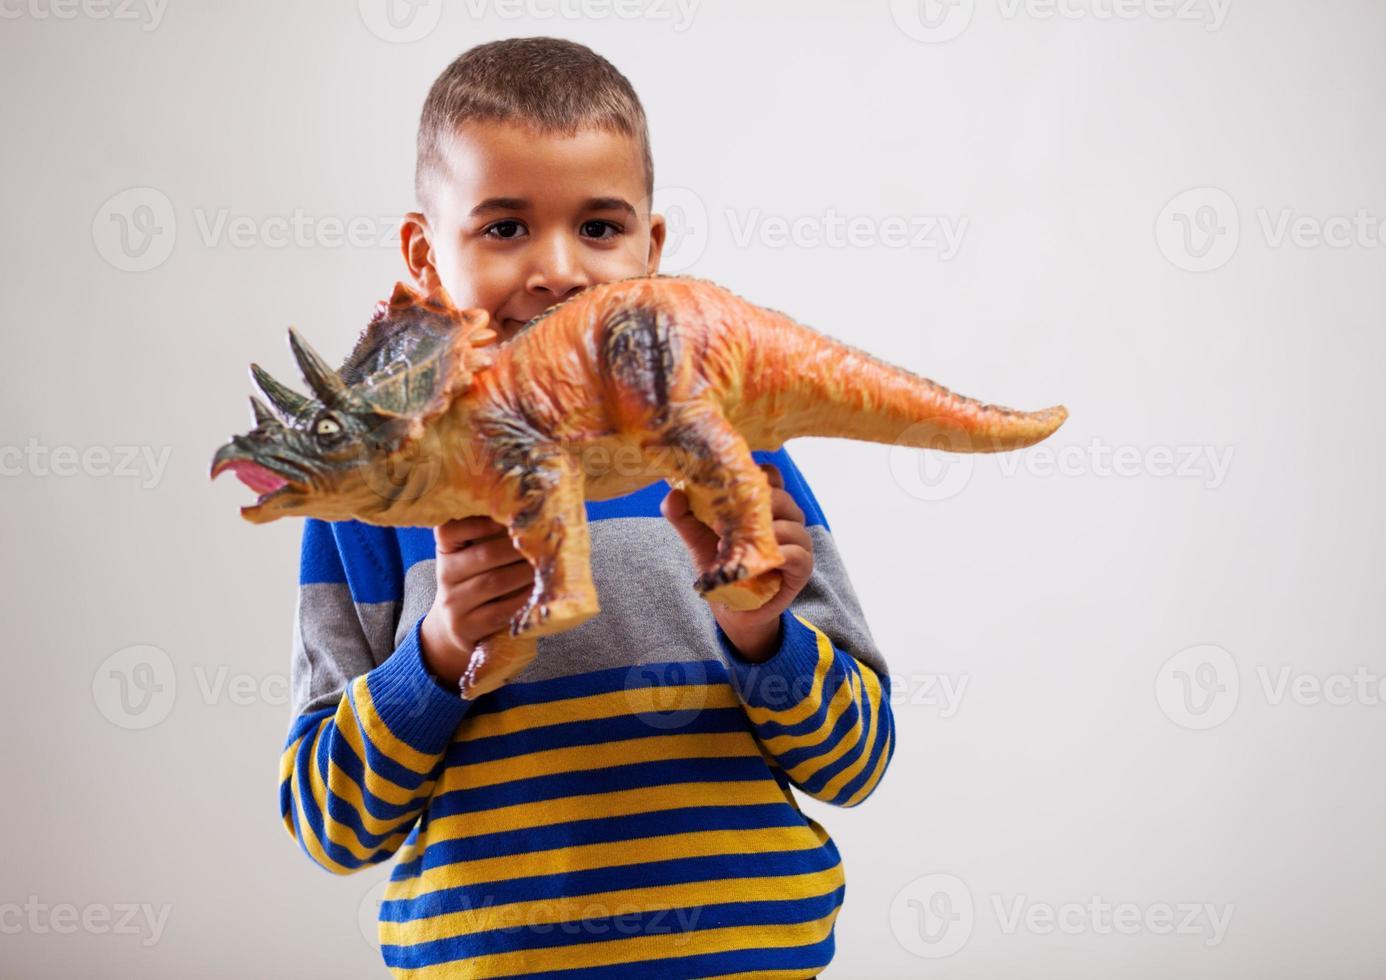 bambino e giocattolo foto